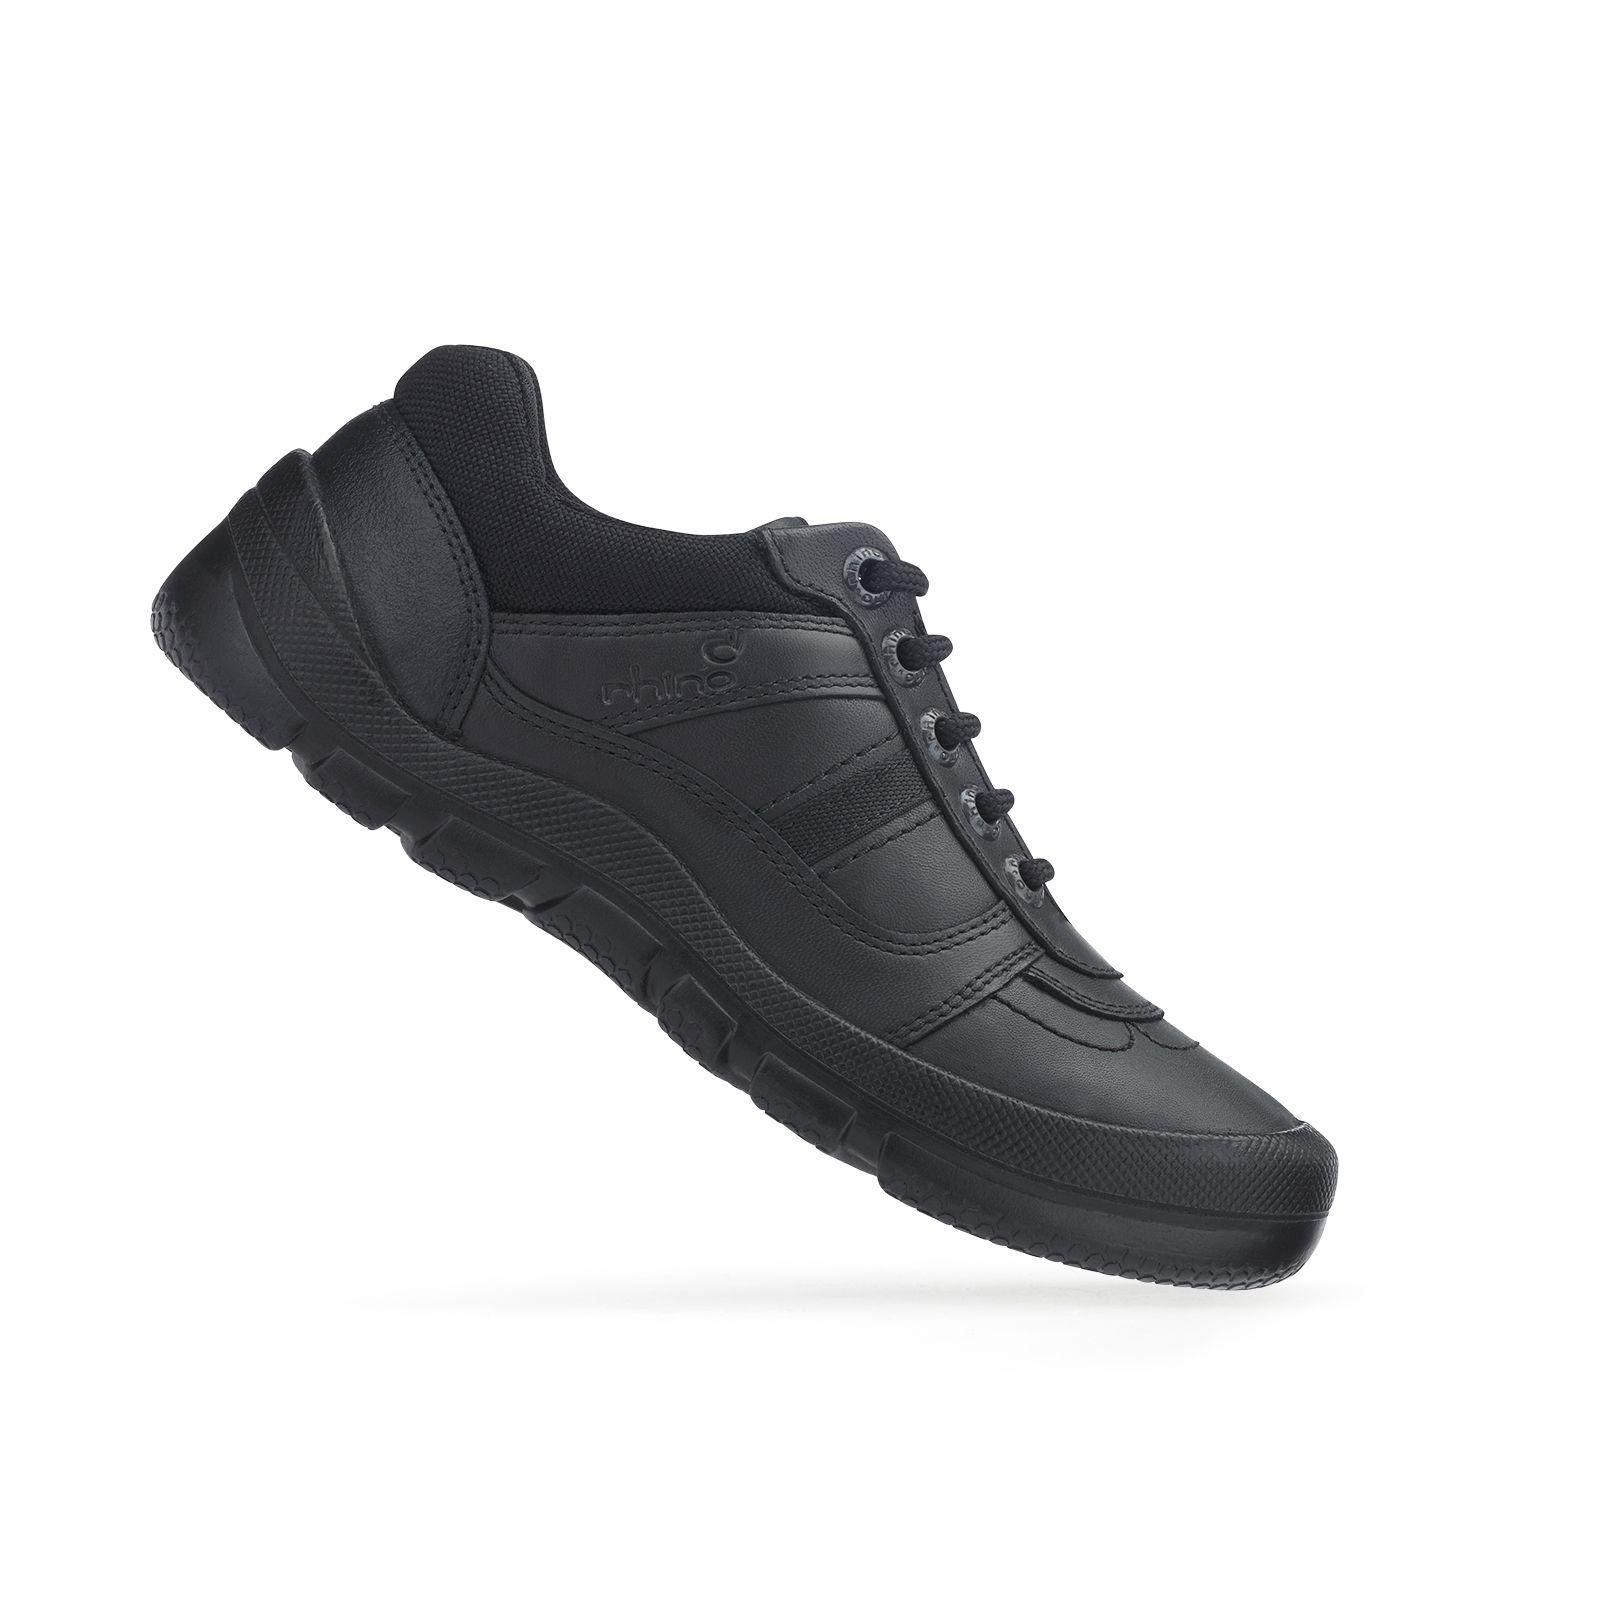 Black leather, Boys school shoes